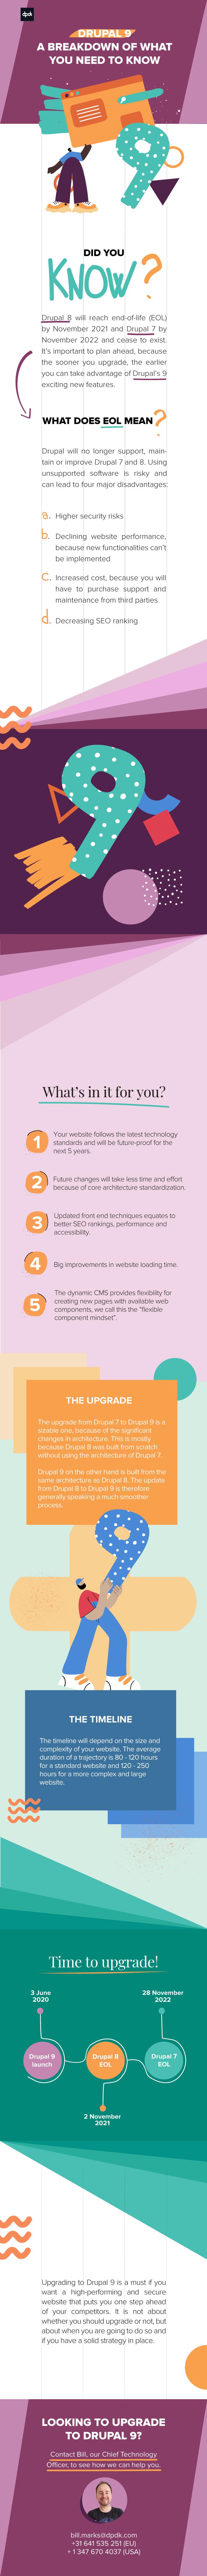 Drupal infographic